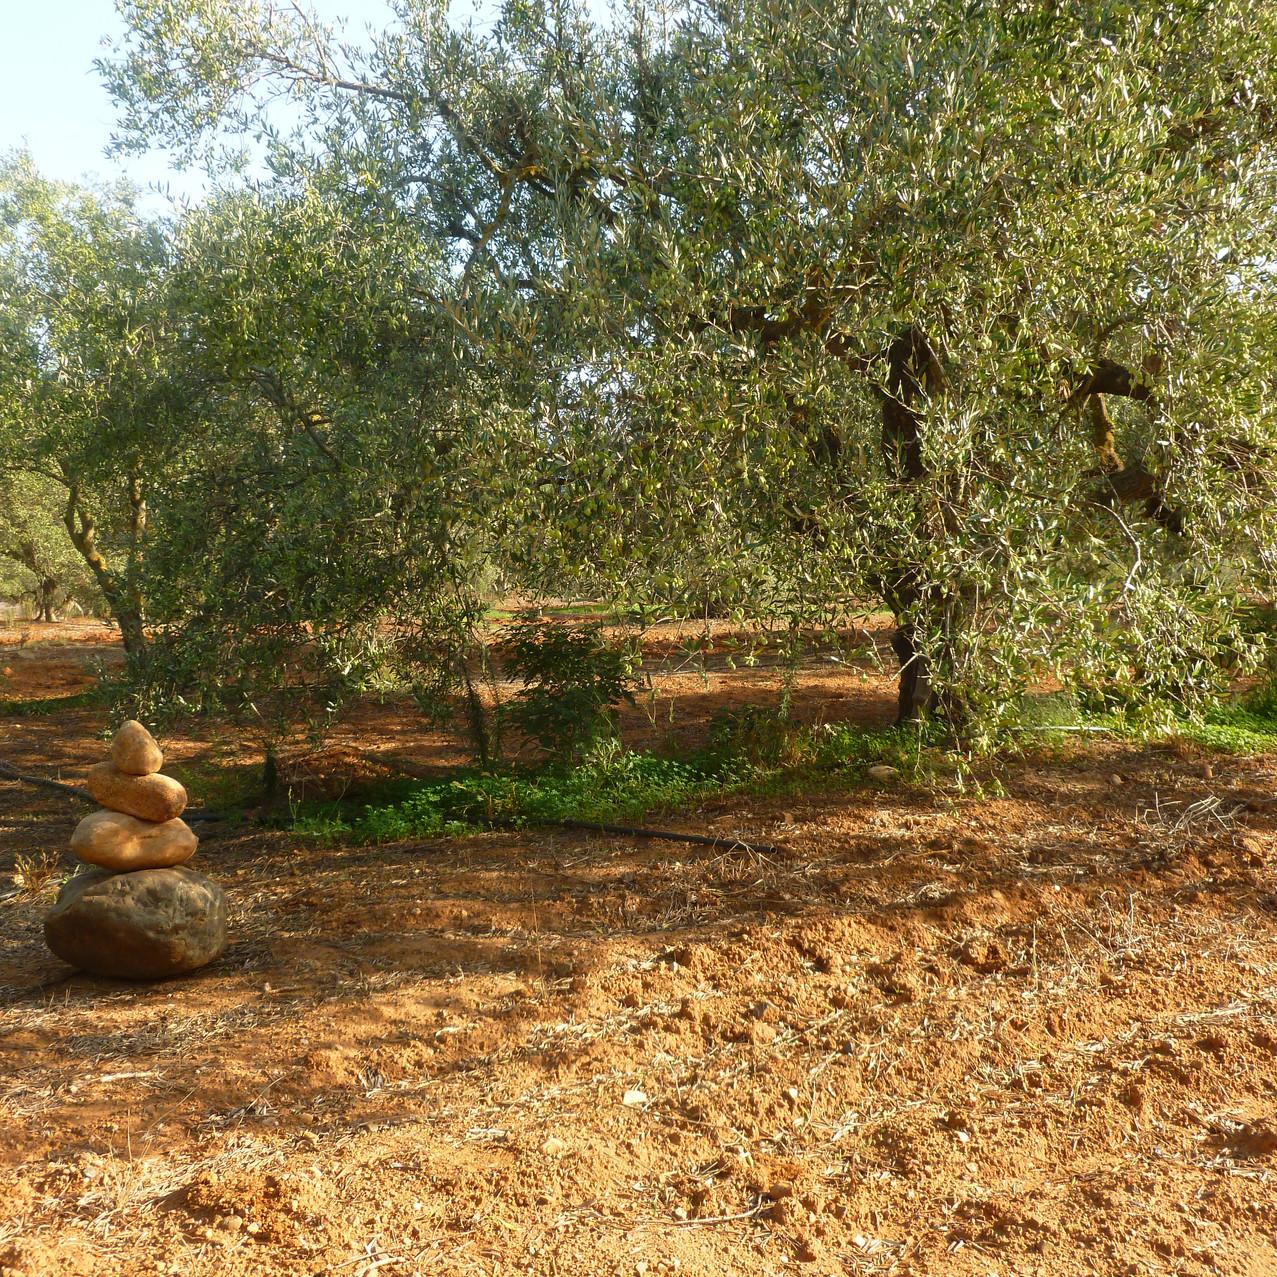 oliveraie_crete_tinafto_huile_d_olive